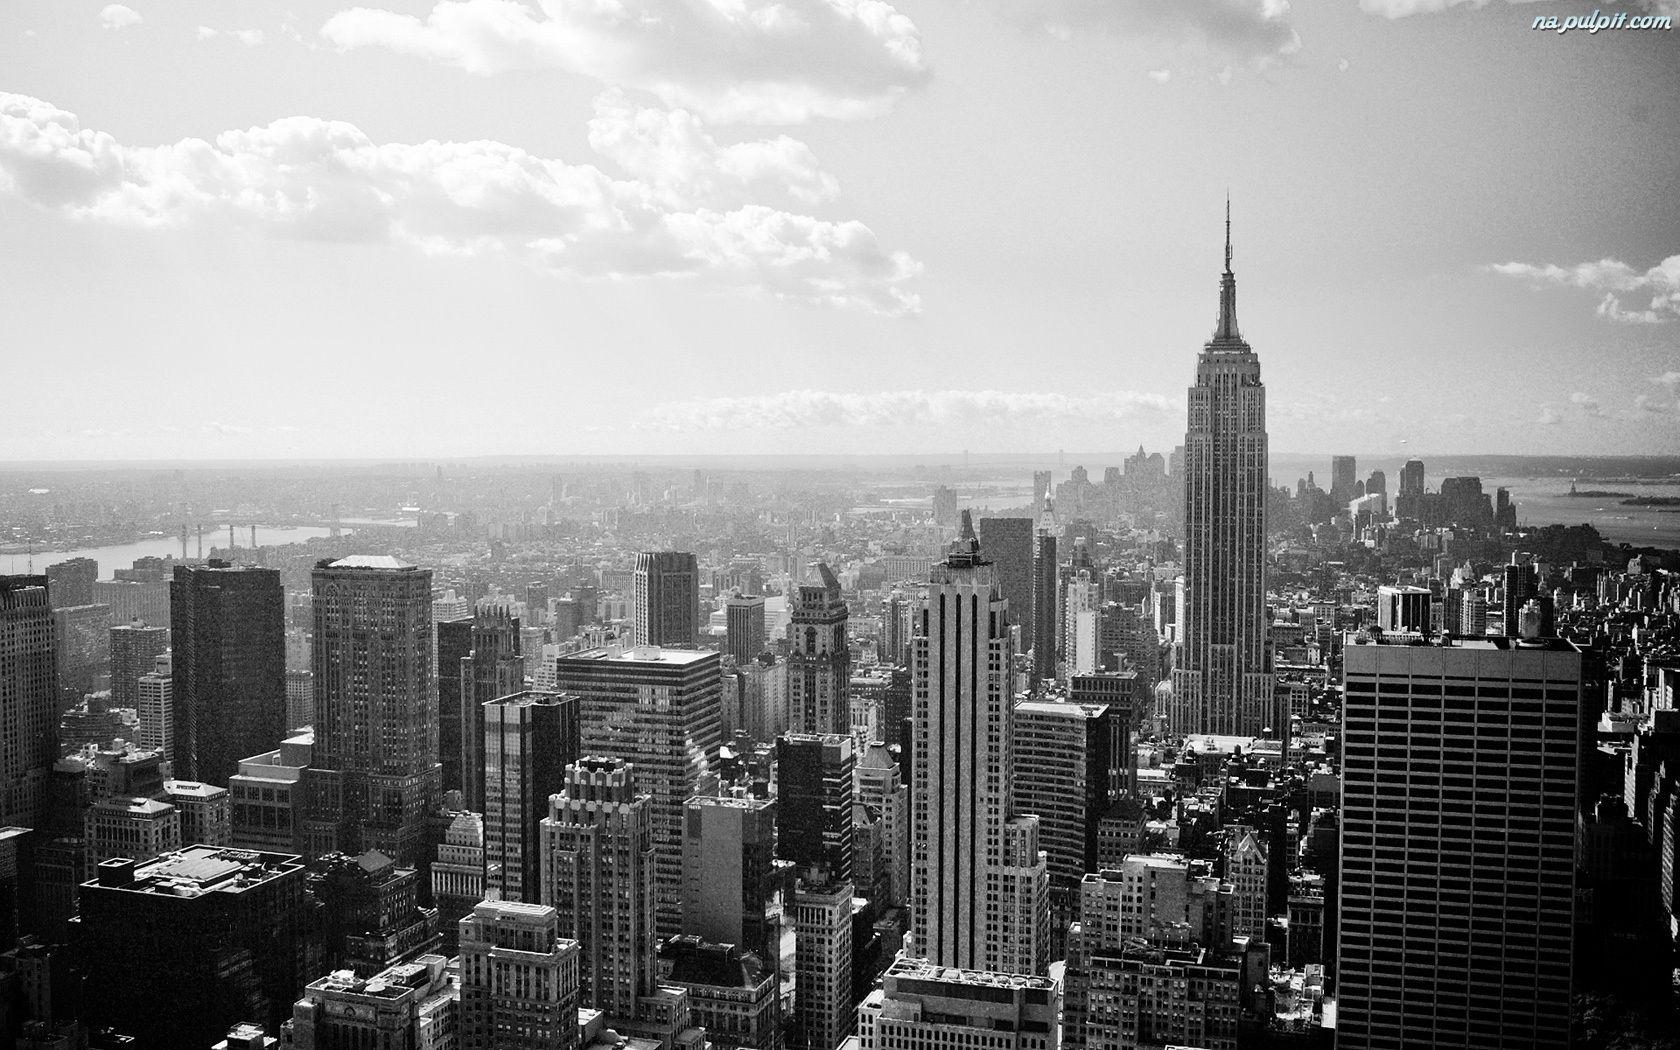 Httptapeta zdjecie nowy jork czarno biale pulpit new york city empire state building black and white hd wallpaper voltagebd Images